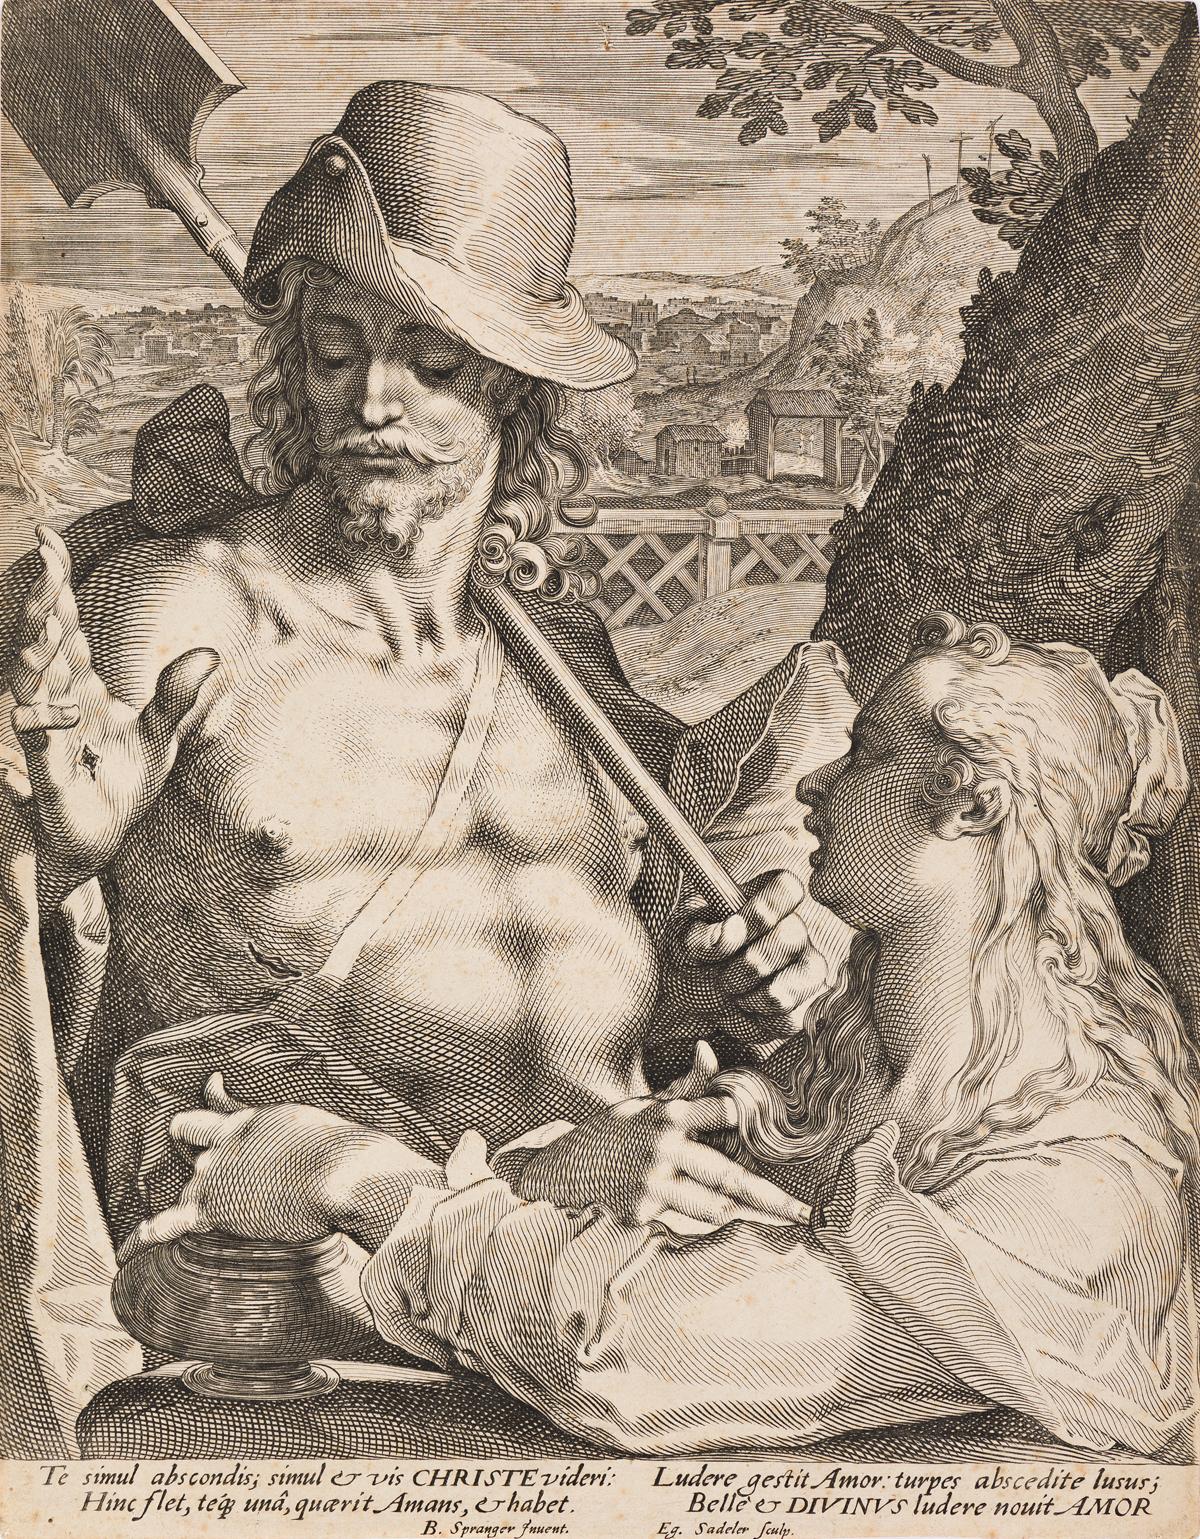 AEGIDIUS SADELER (after Bartholomeus Spranger) Christ Appears as a Gardener to Mary Magdalene (Noli mi tangere)